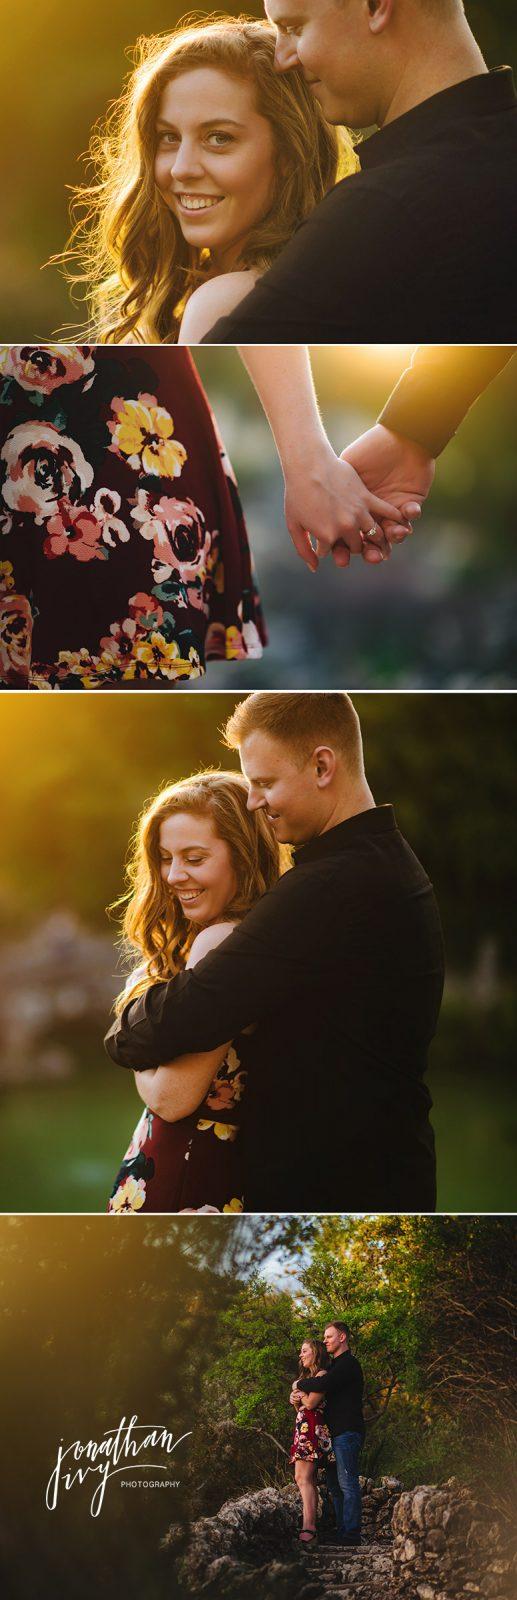 Gorgeous Sun Flare Engagement Photo Couple Poses Ideas